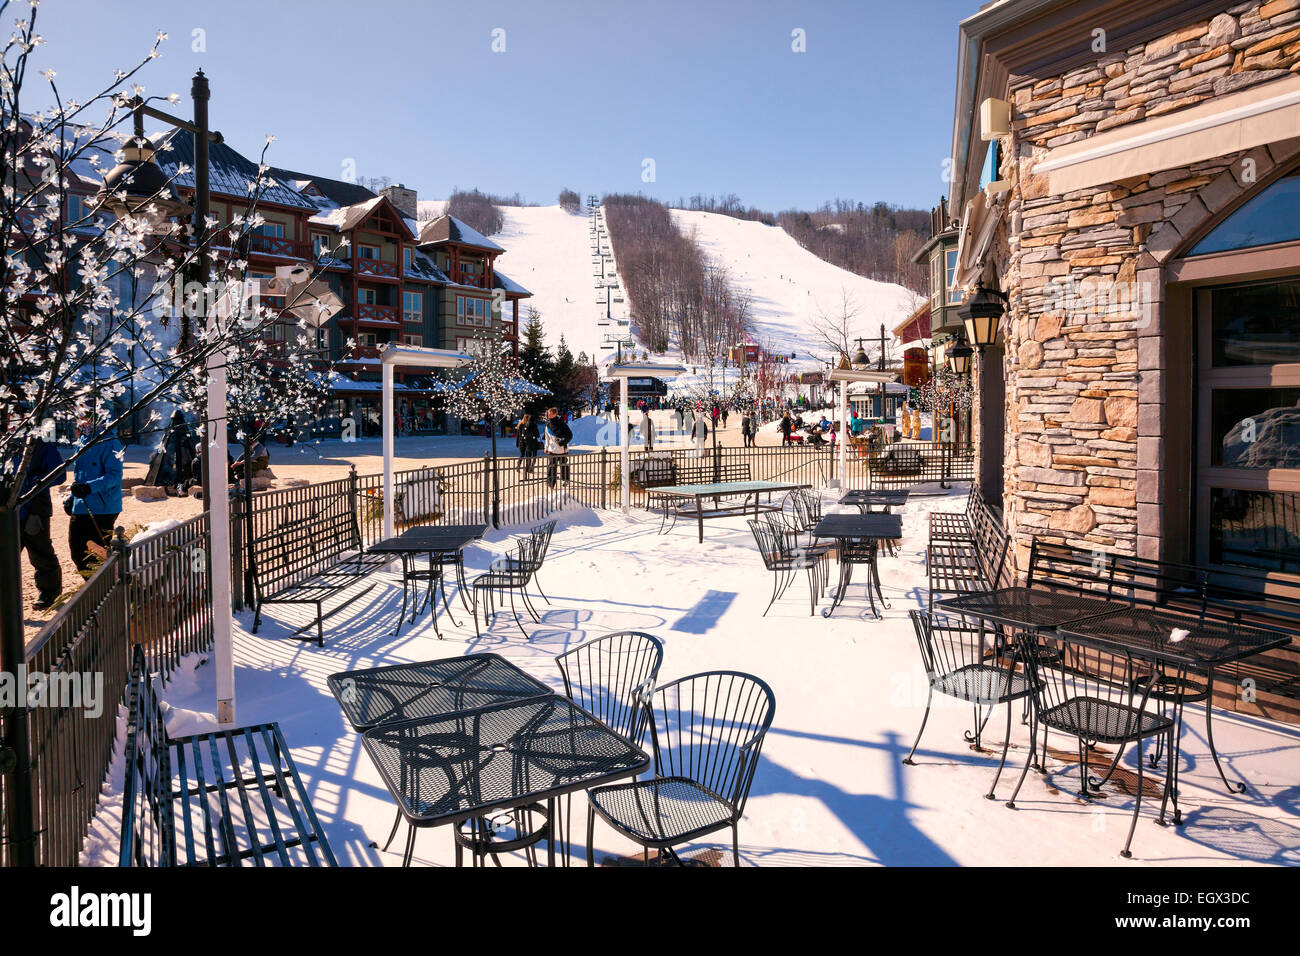 ontario's premier ski resort blue mountain in stock photo: 79249448